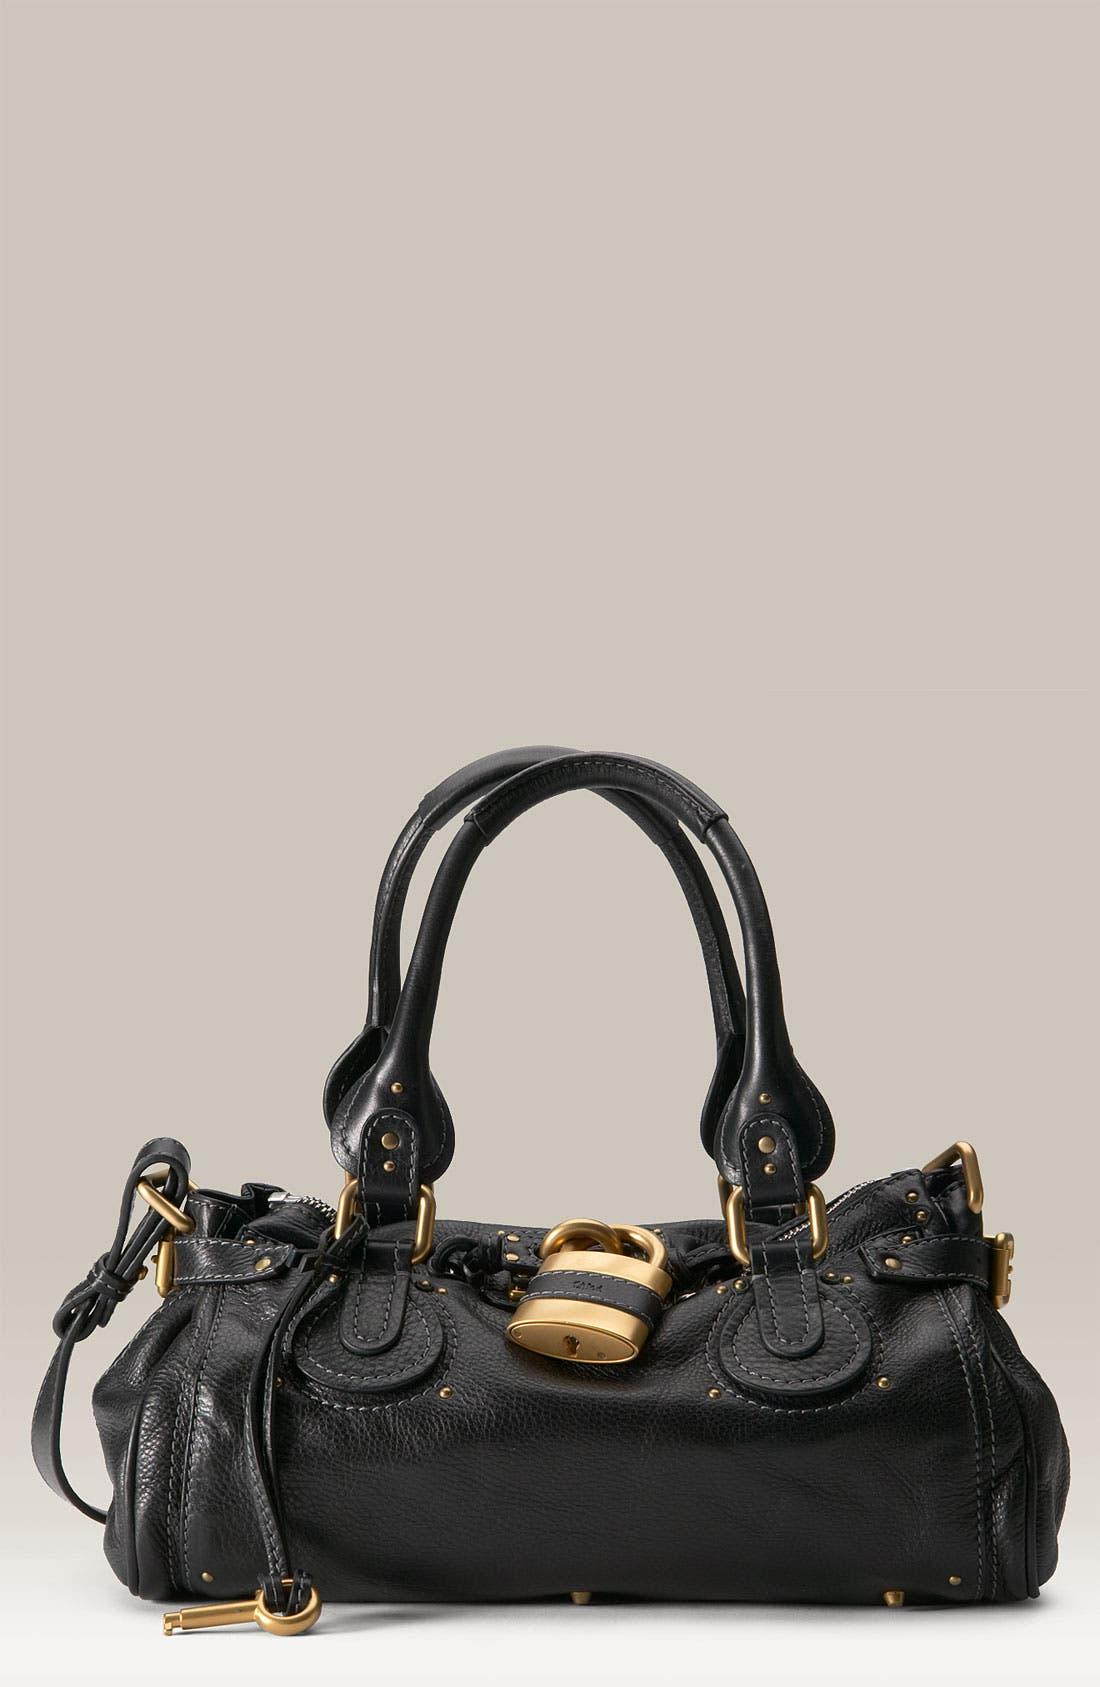 Alternate Image 1 Selected - Chloé 'Paddington' Leather Padlock Satchel